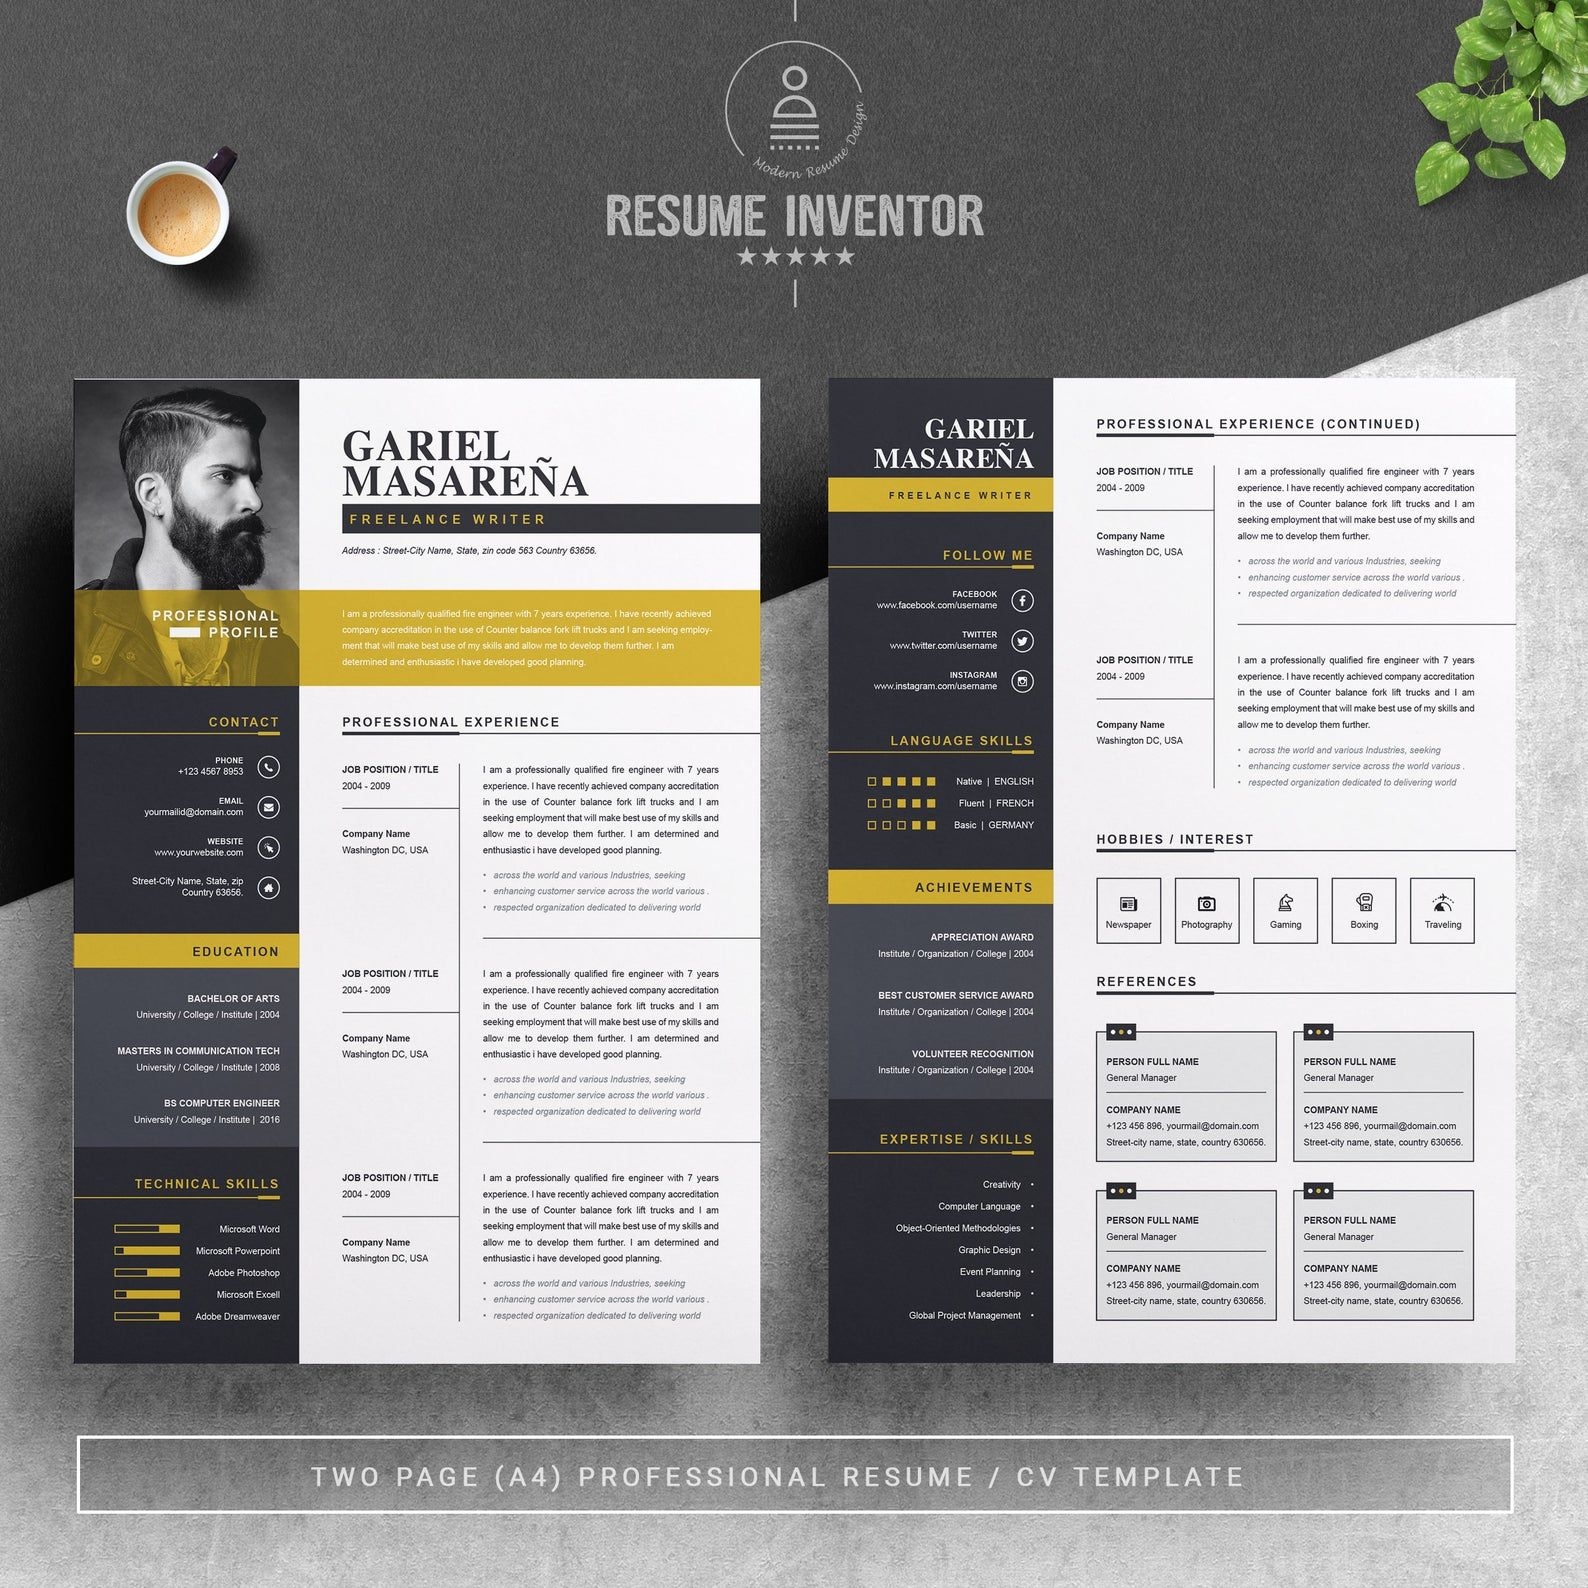 Resume Template Modern Professional Resume Template For Etsy In 2020 Resume Template Professional Resume Design Template Resume Template Word